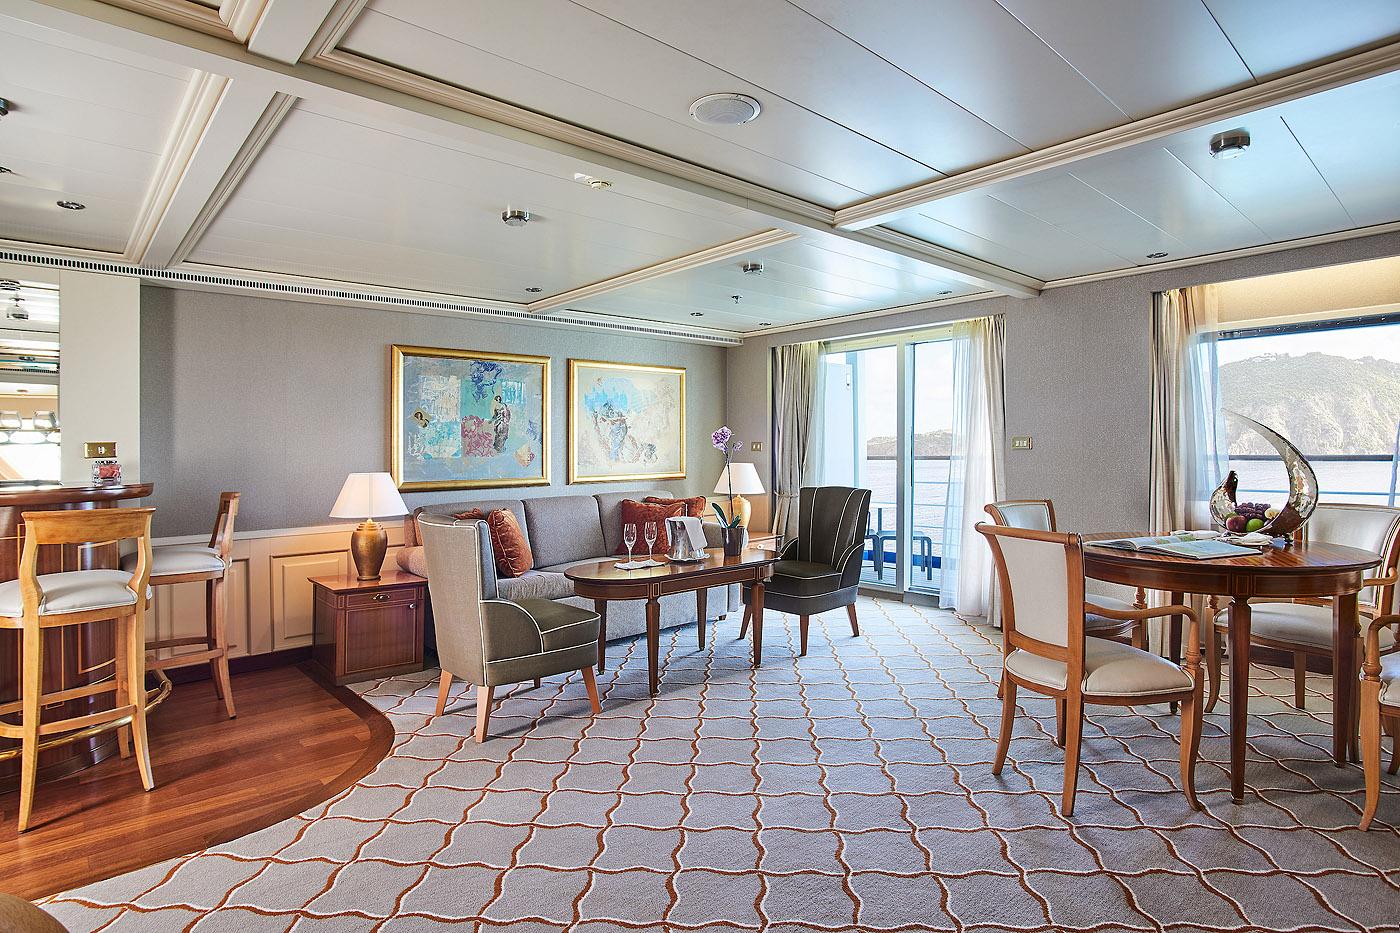 Royal Suite R1 / R2 2 Schlafzimmer - Silver Whisper - Bild 5 - Thumb